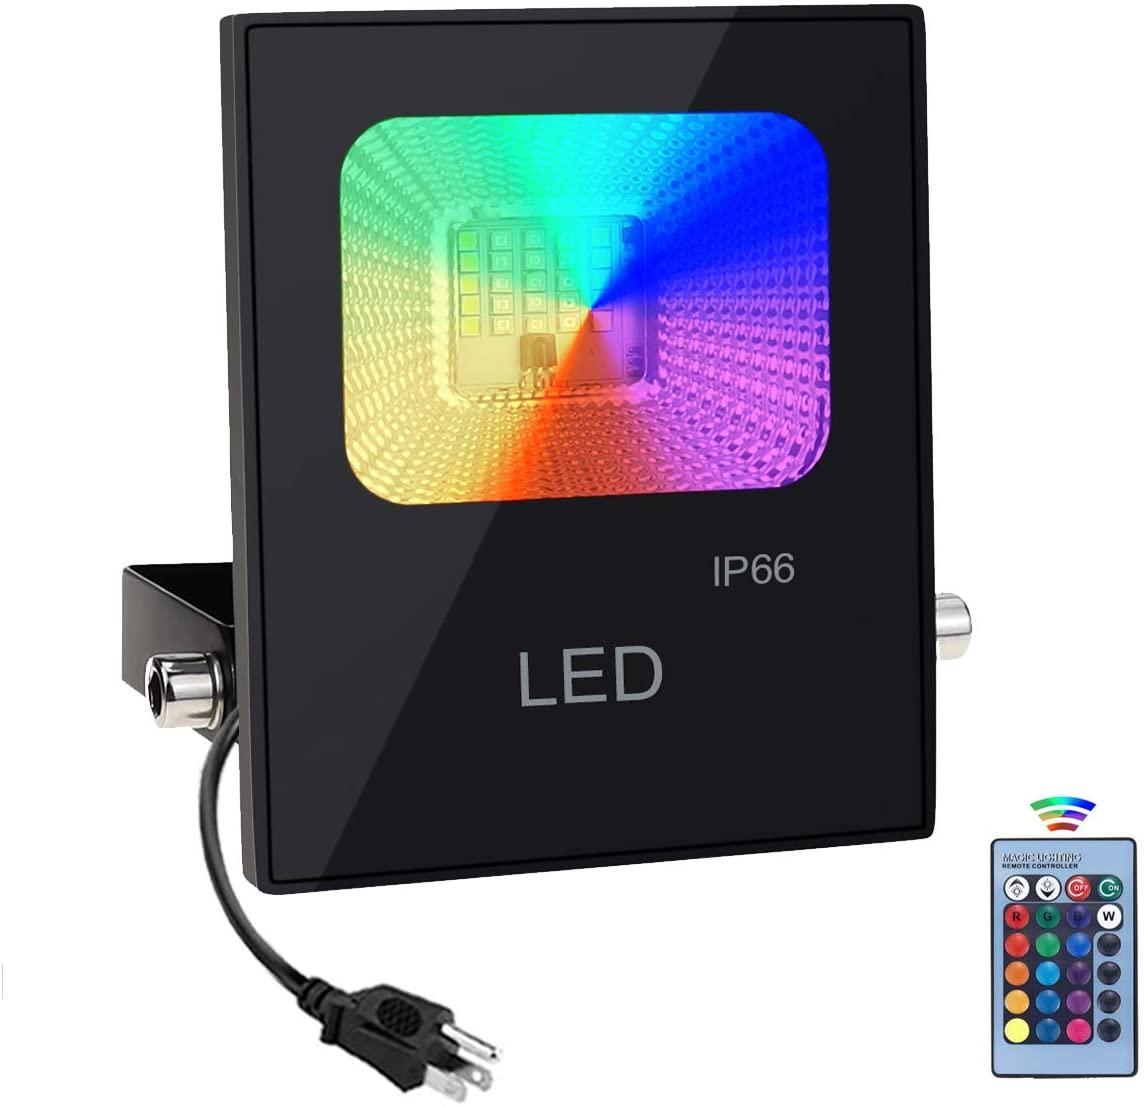 Foco LED RGB 60W con control remoto